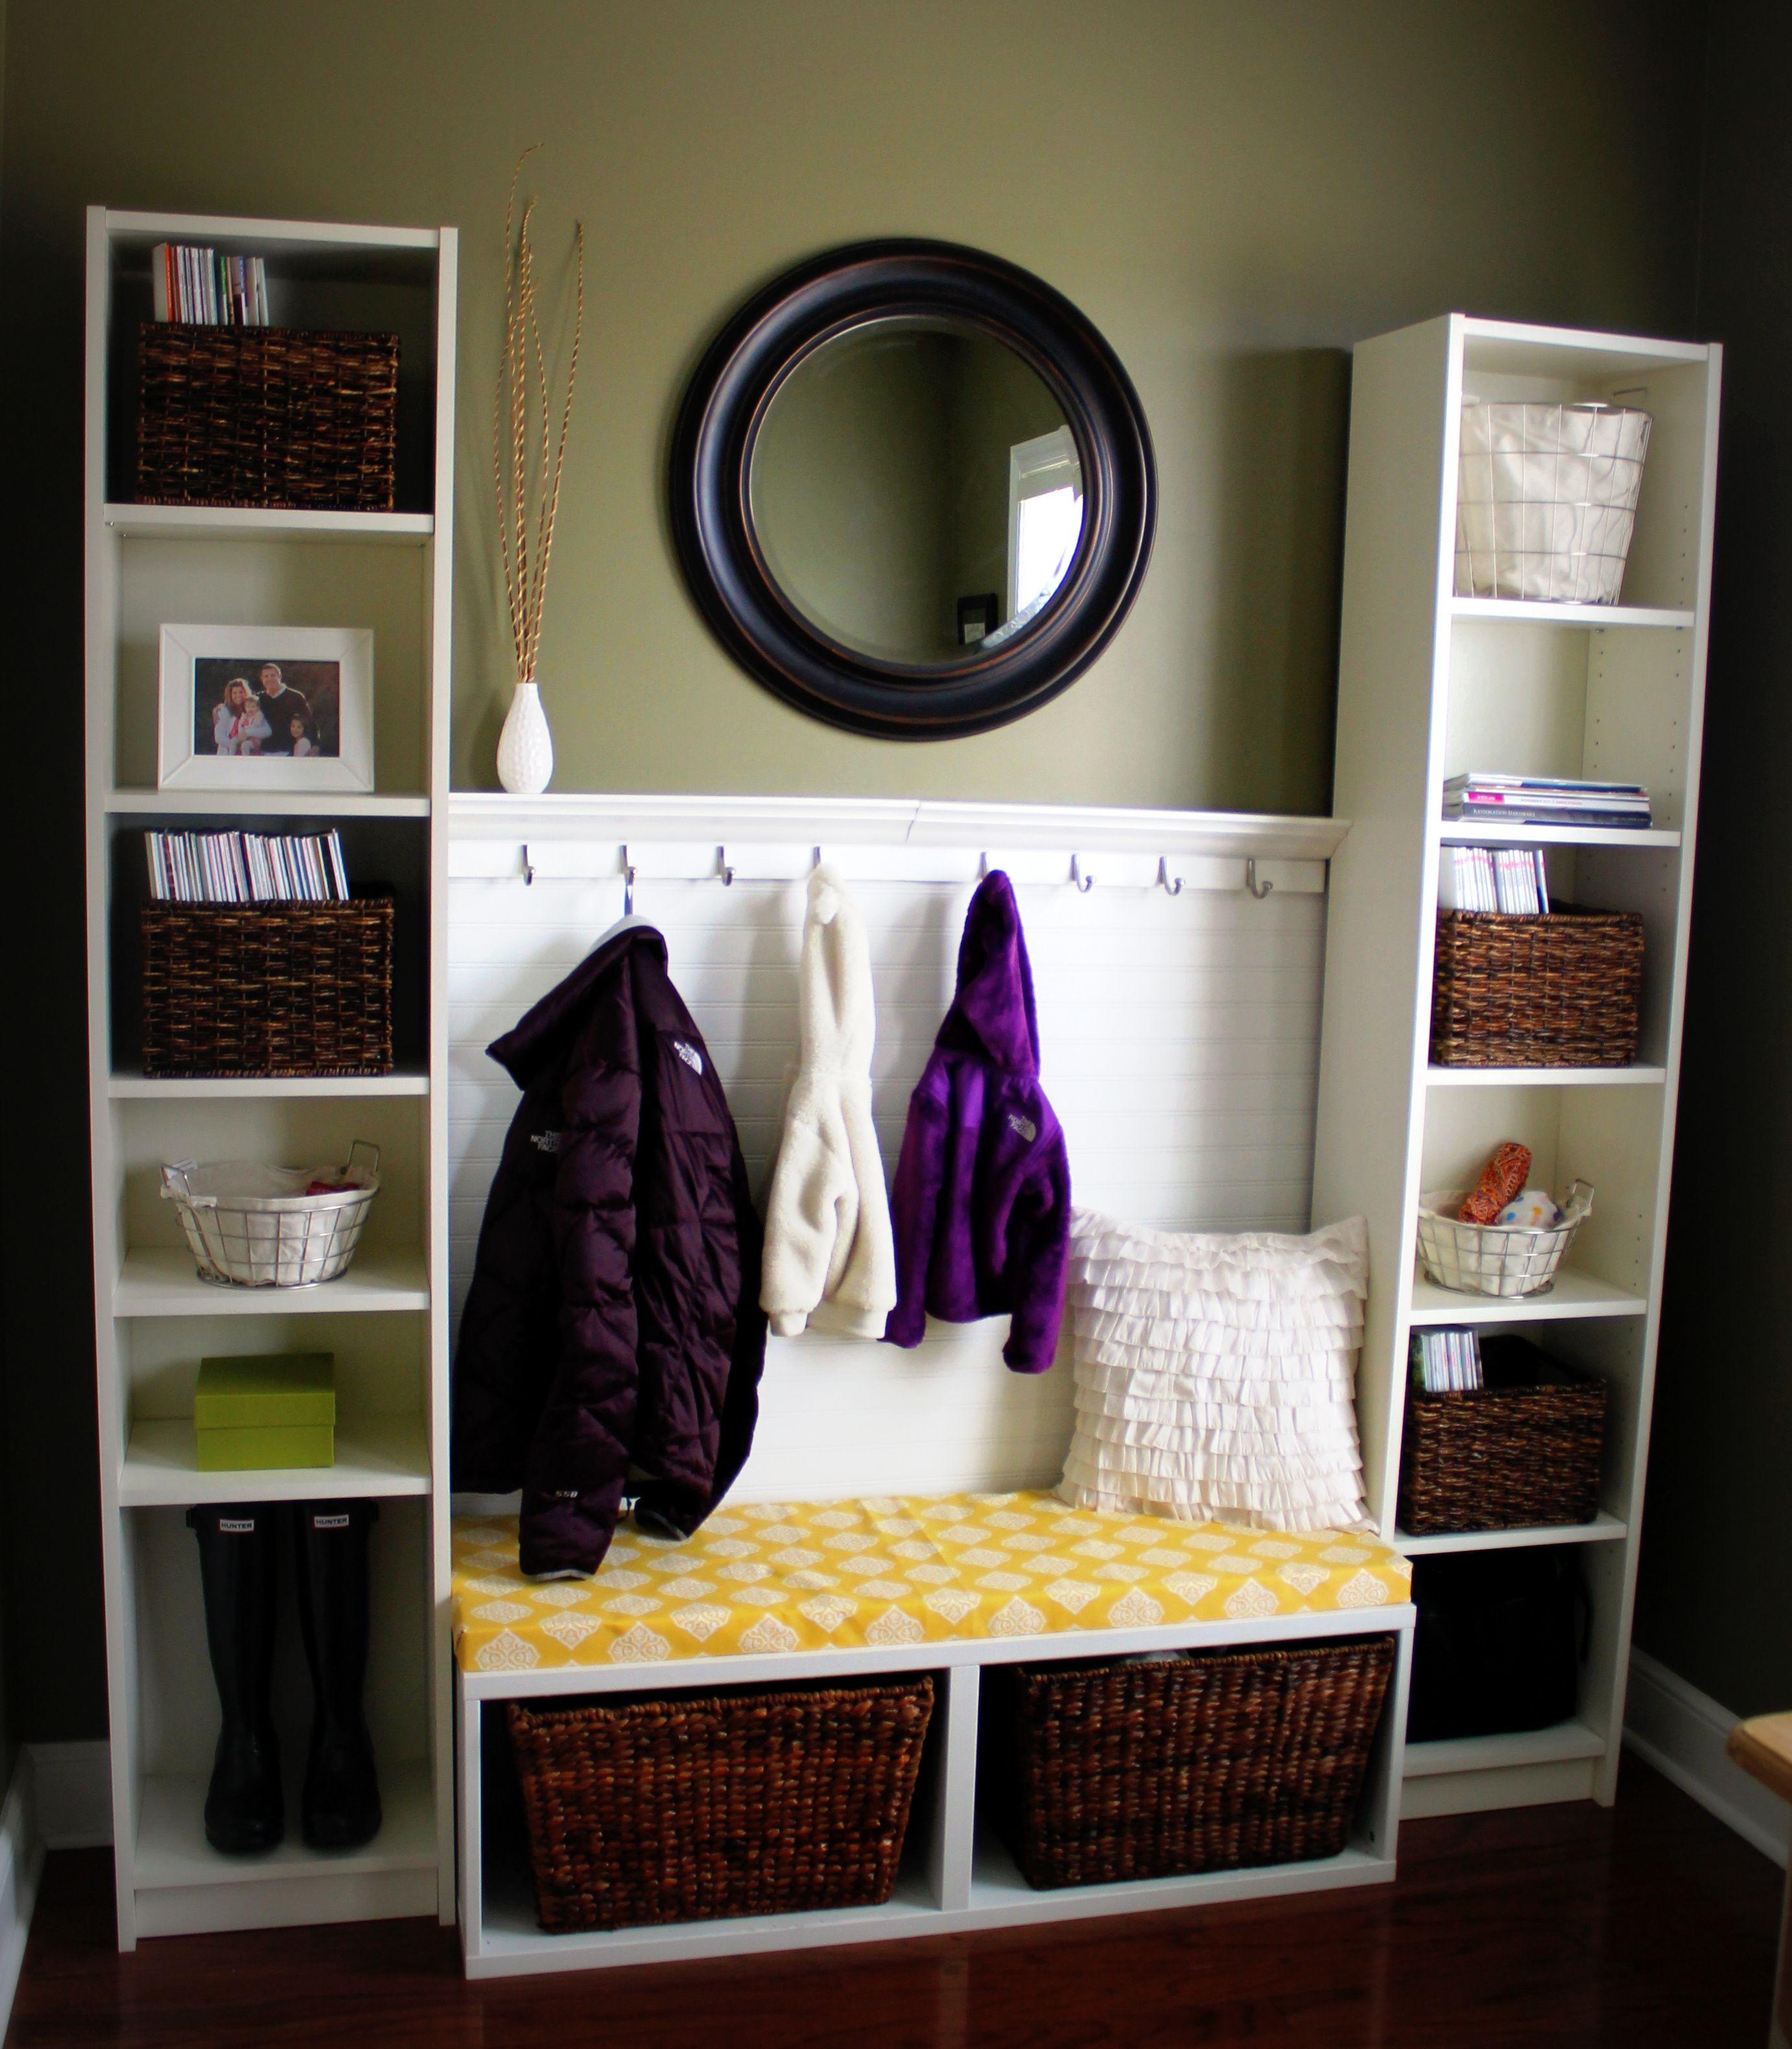 ~ DIY Mudroom Area ~  Created using:  * Bookshelves/Bench from IKEA  * Bead board from Lowe's  * Foam/fabric cushion (JoAnn's)  * 2 sets of hooks w/shelf  * Target mirror/ baskets